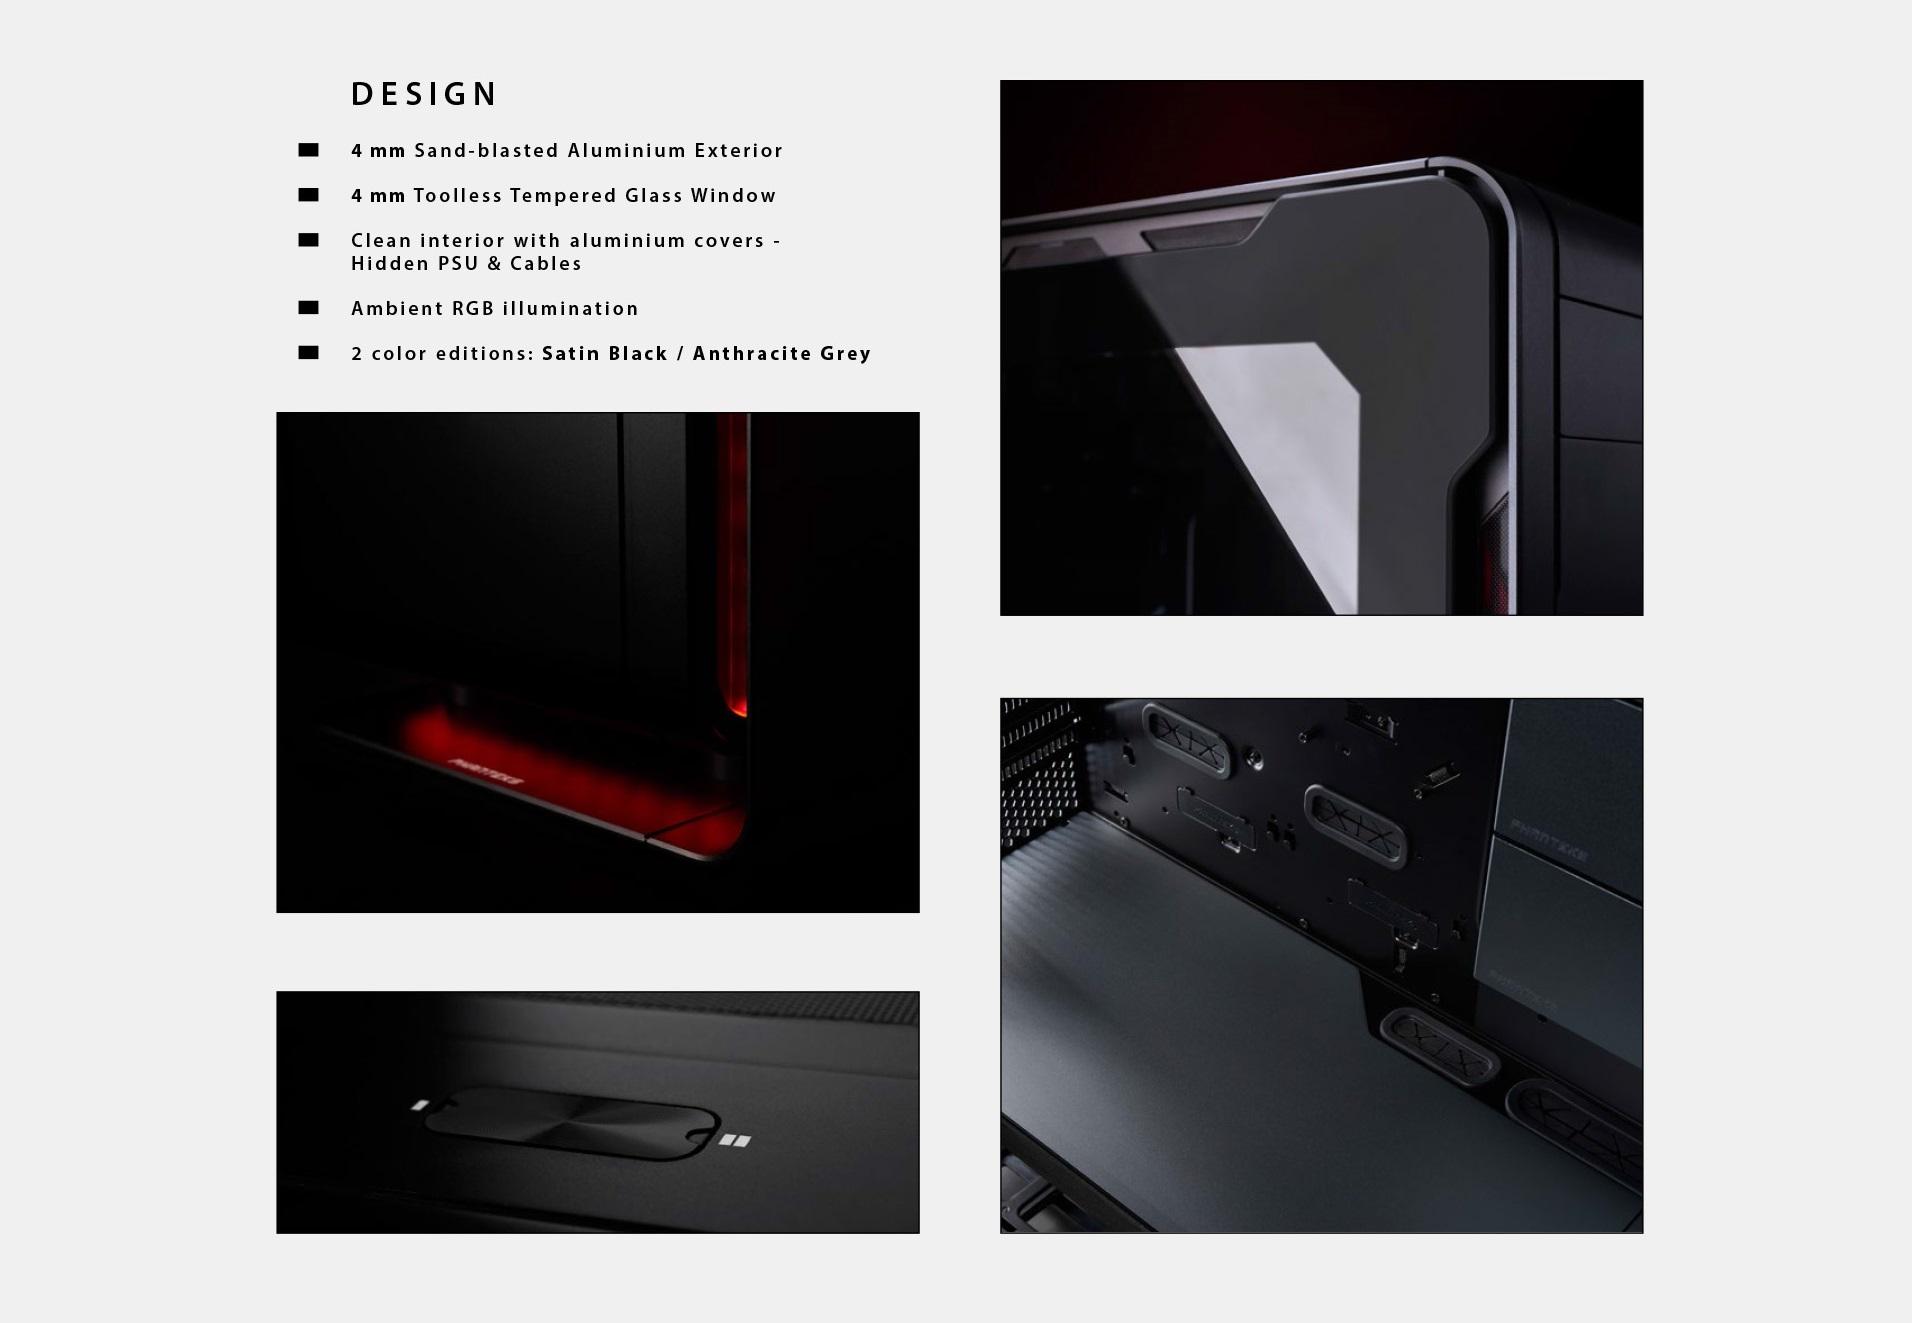 Phanteks Enthoo Elite Extreme RGB Lighting, Tempered Glass Window, Dual System Support thiết kế